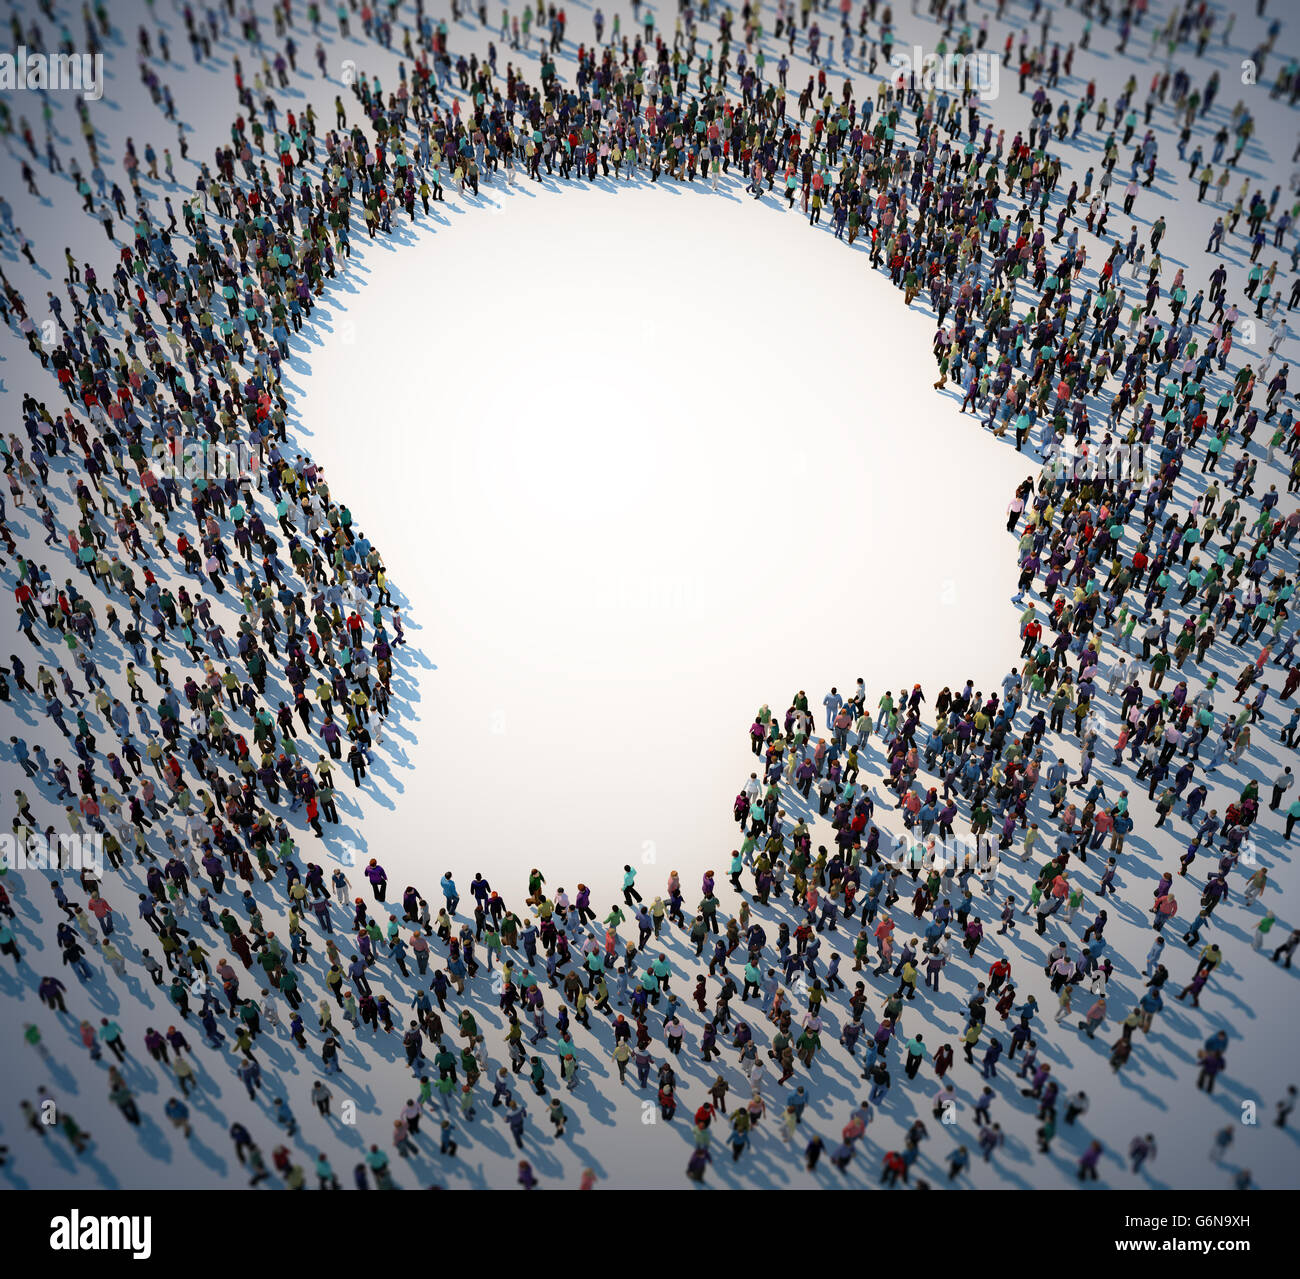 Gran grupo de personas que constituyen un símbolo de cabeza - Ilustración 3D Imagen De Stock